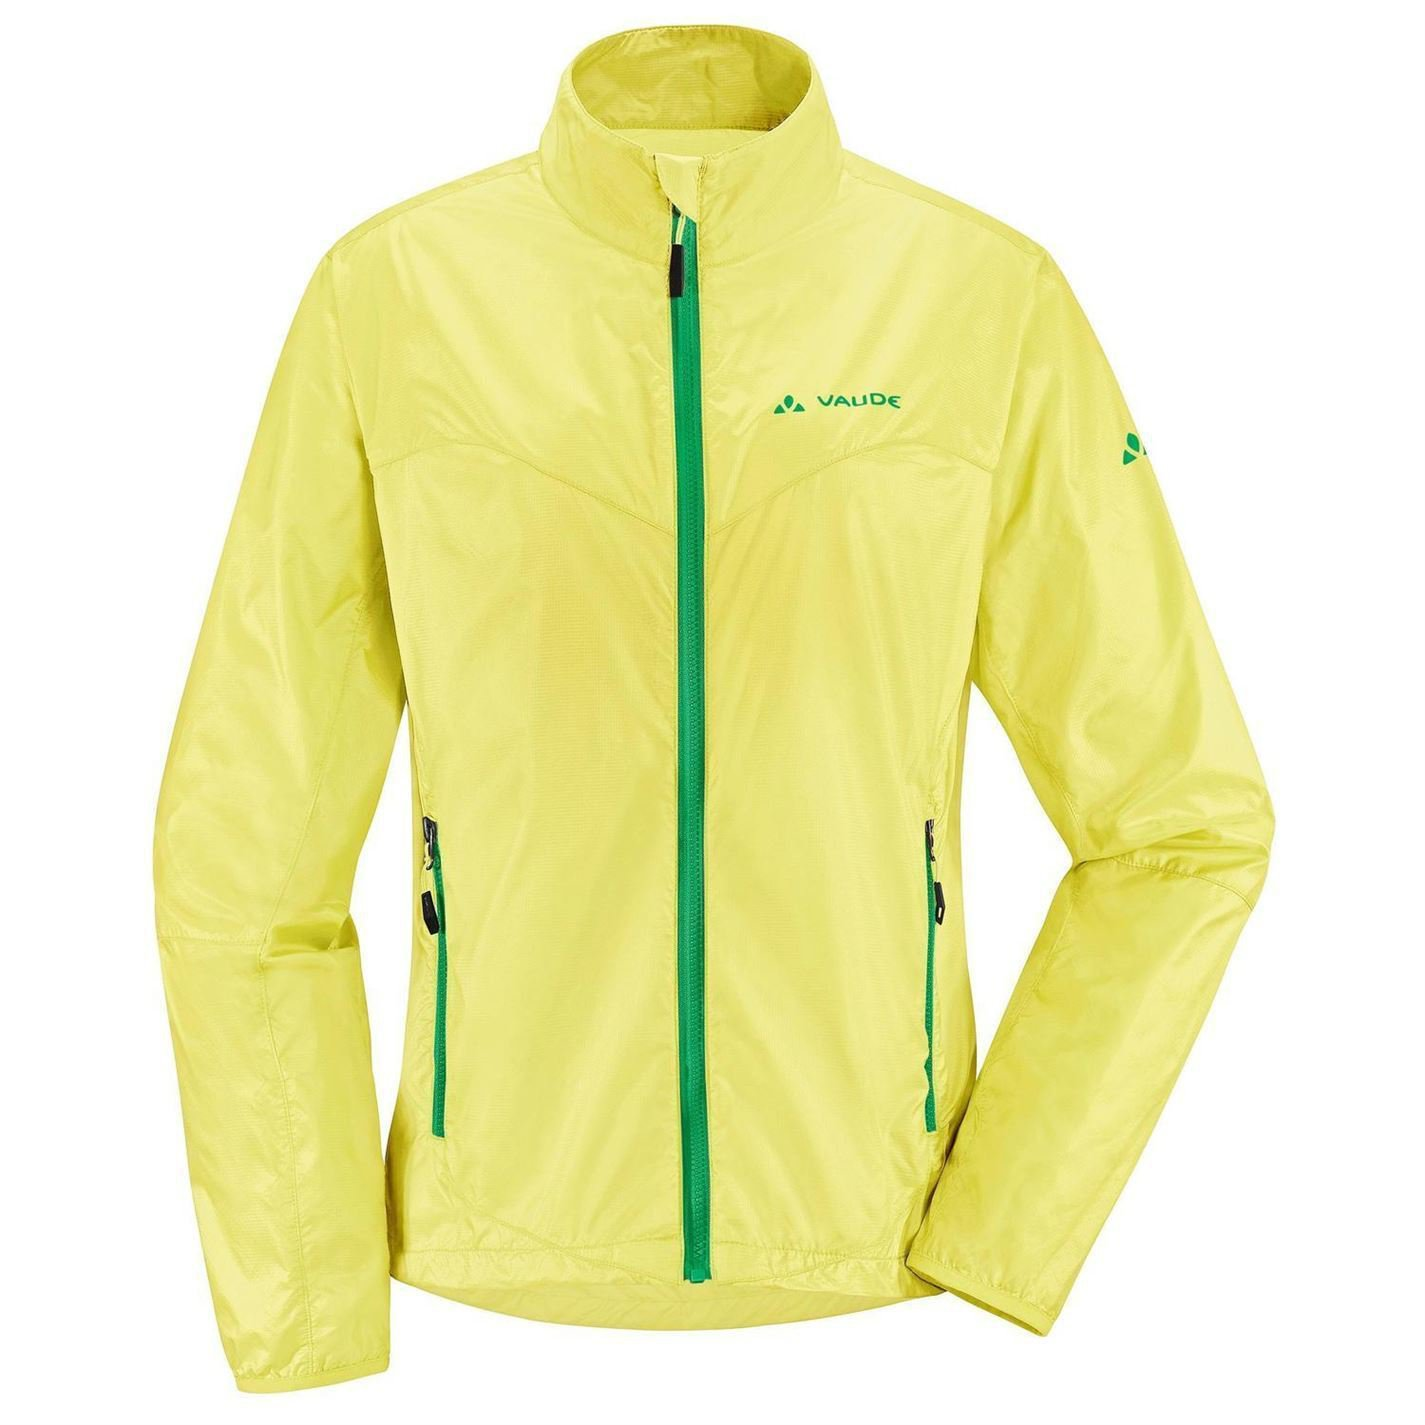 Vaude Womens Jacket Dyde Ladies Long Sleeve Zip Cycle Cycling